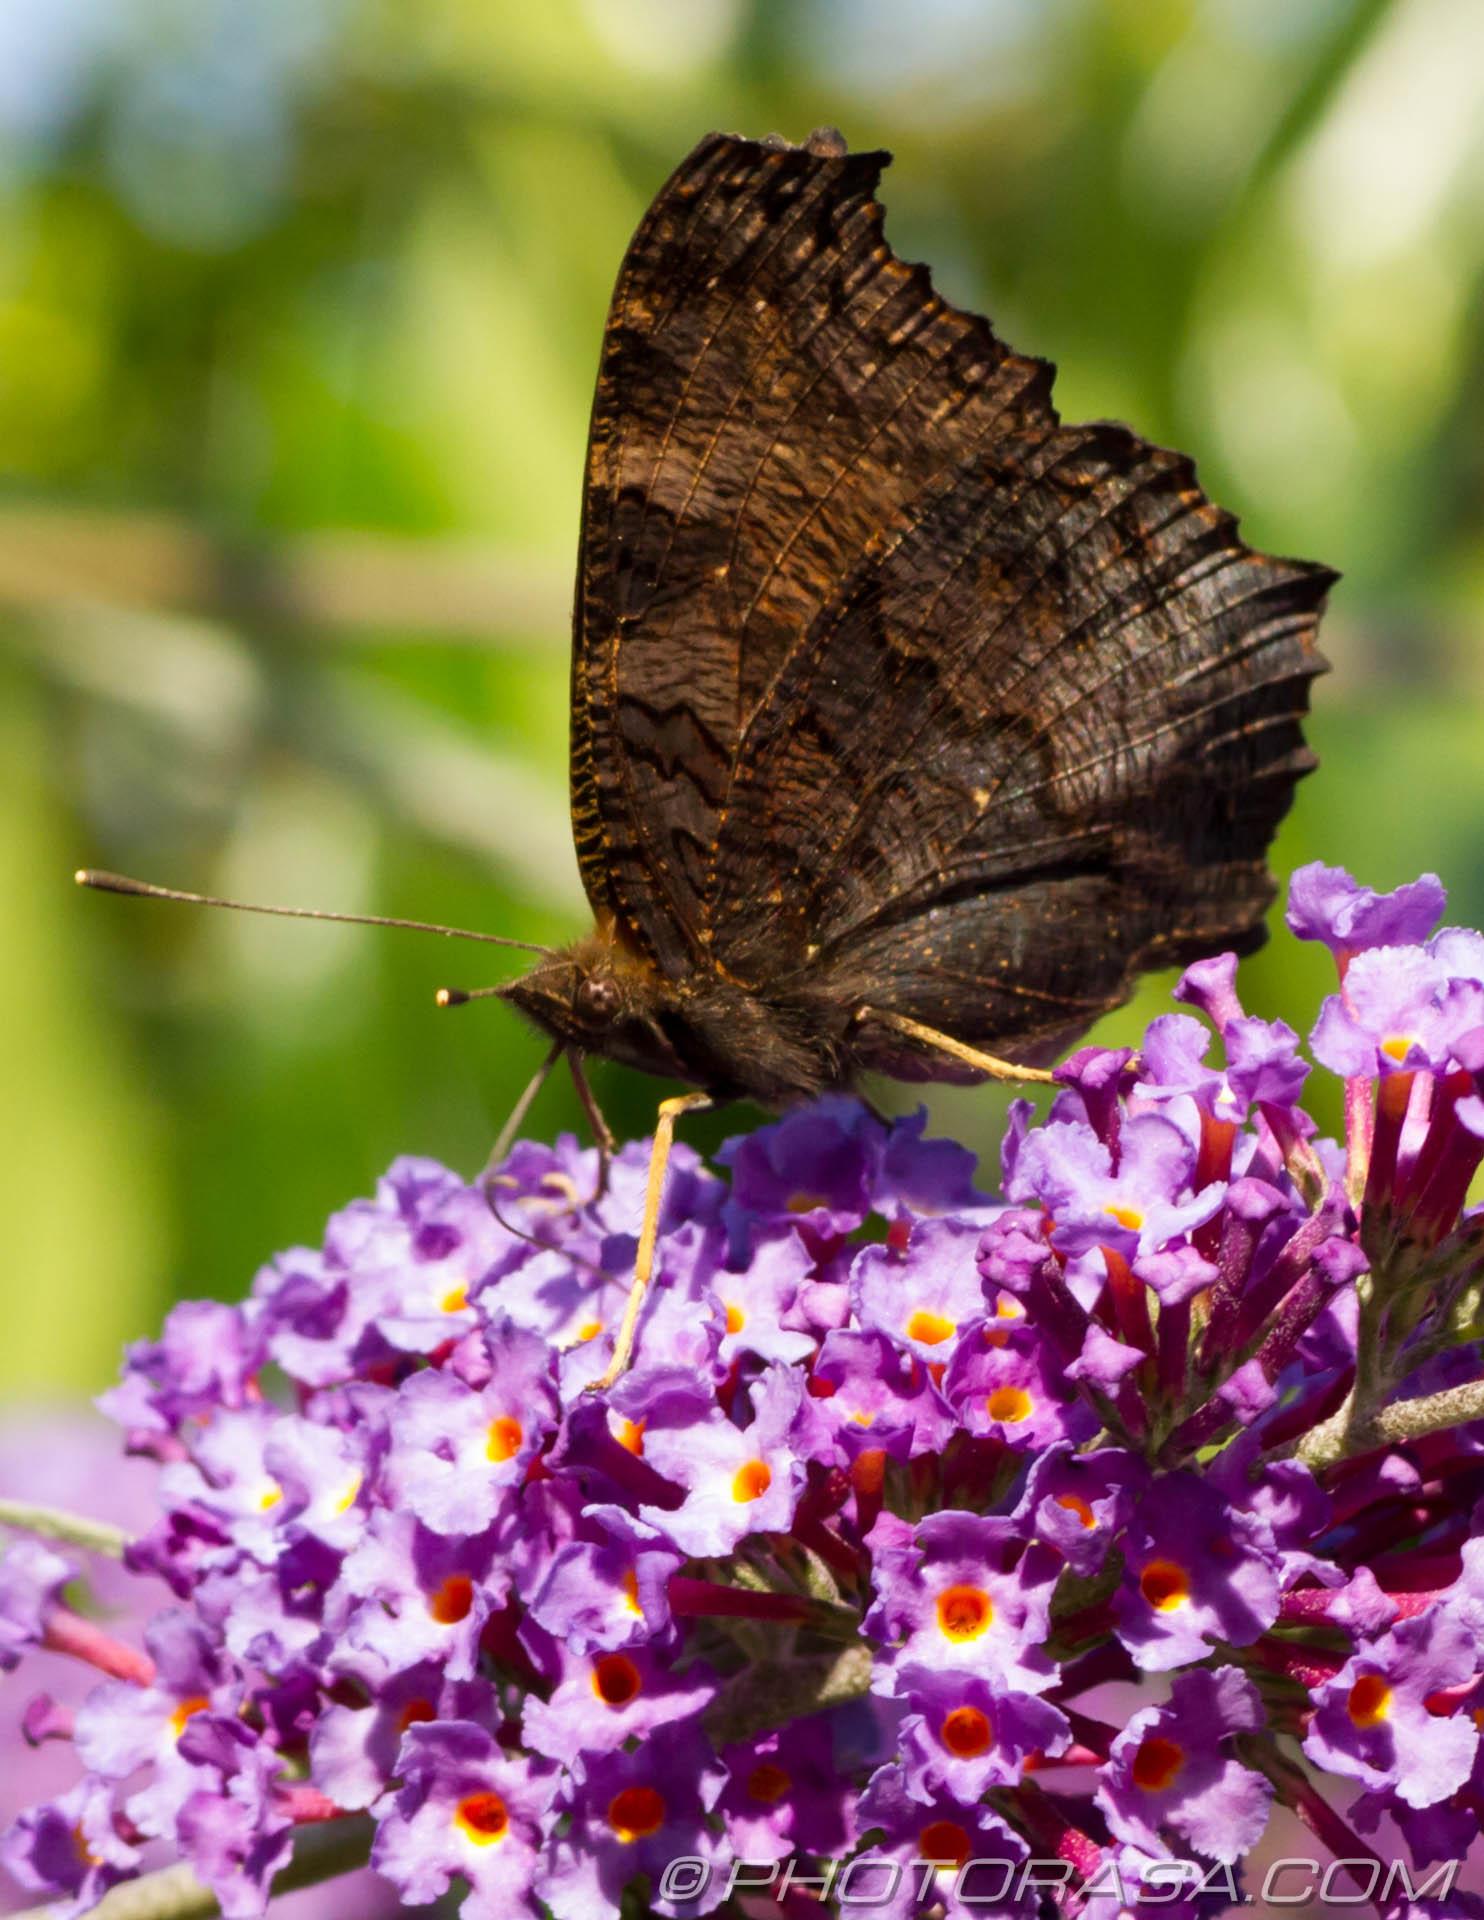 https://photorasa.com/peacock-butterfly/dark-peacock-underside/